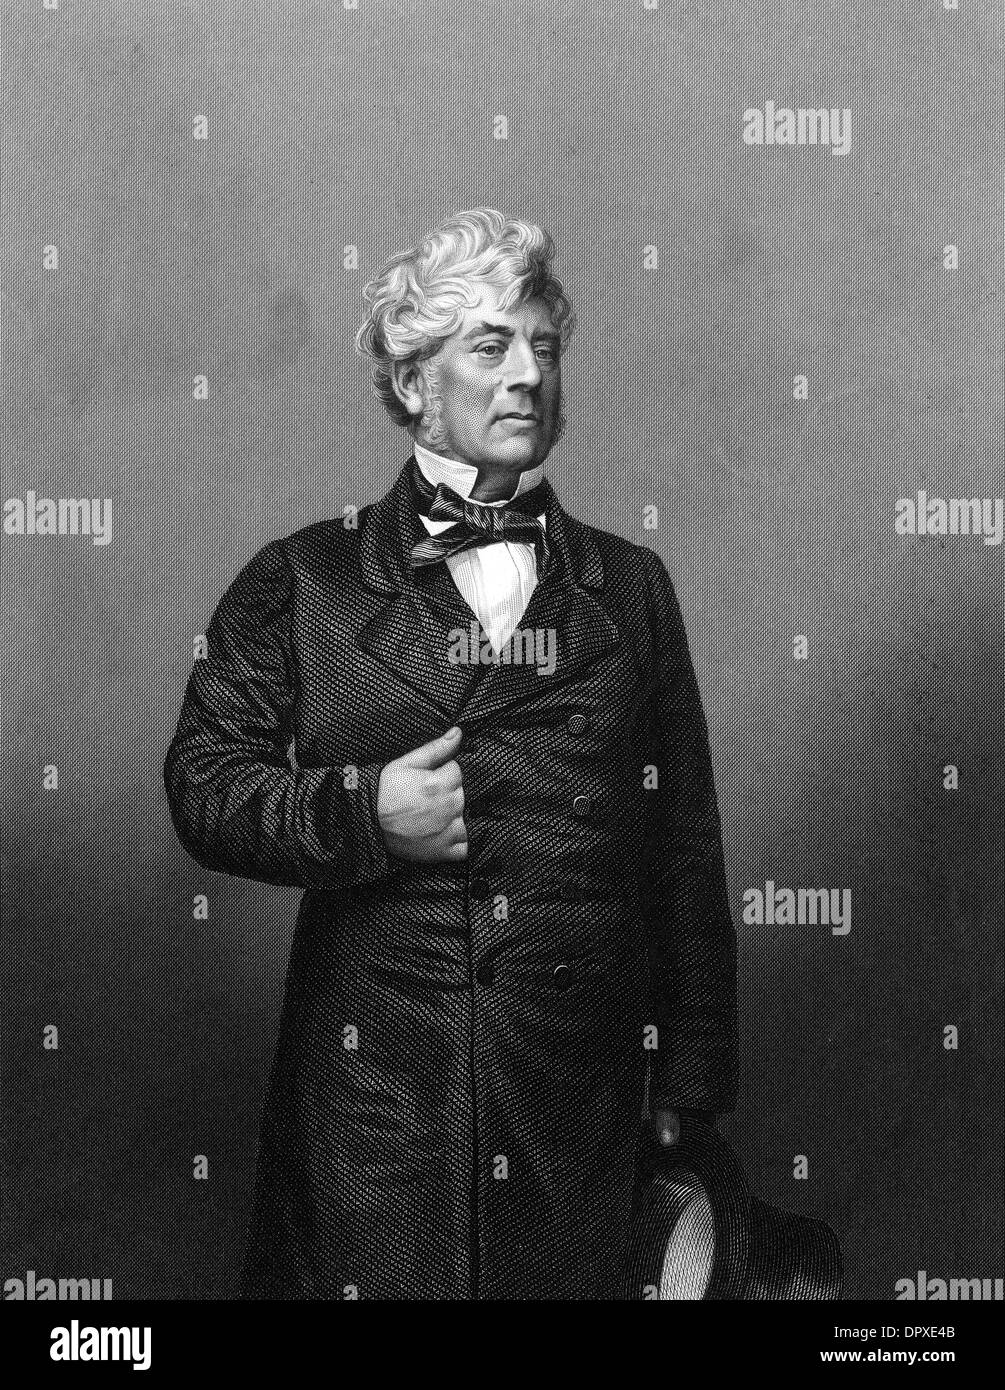 SIR WILLIAM SHEE - Stock Image